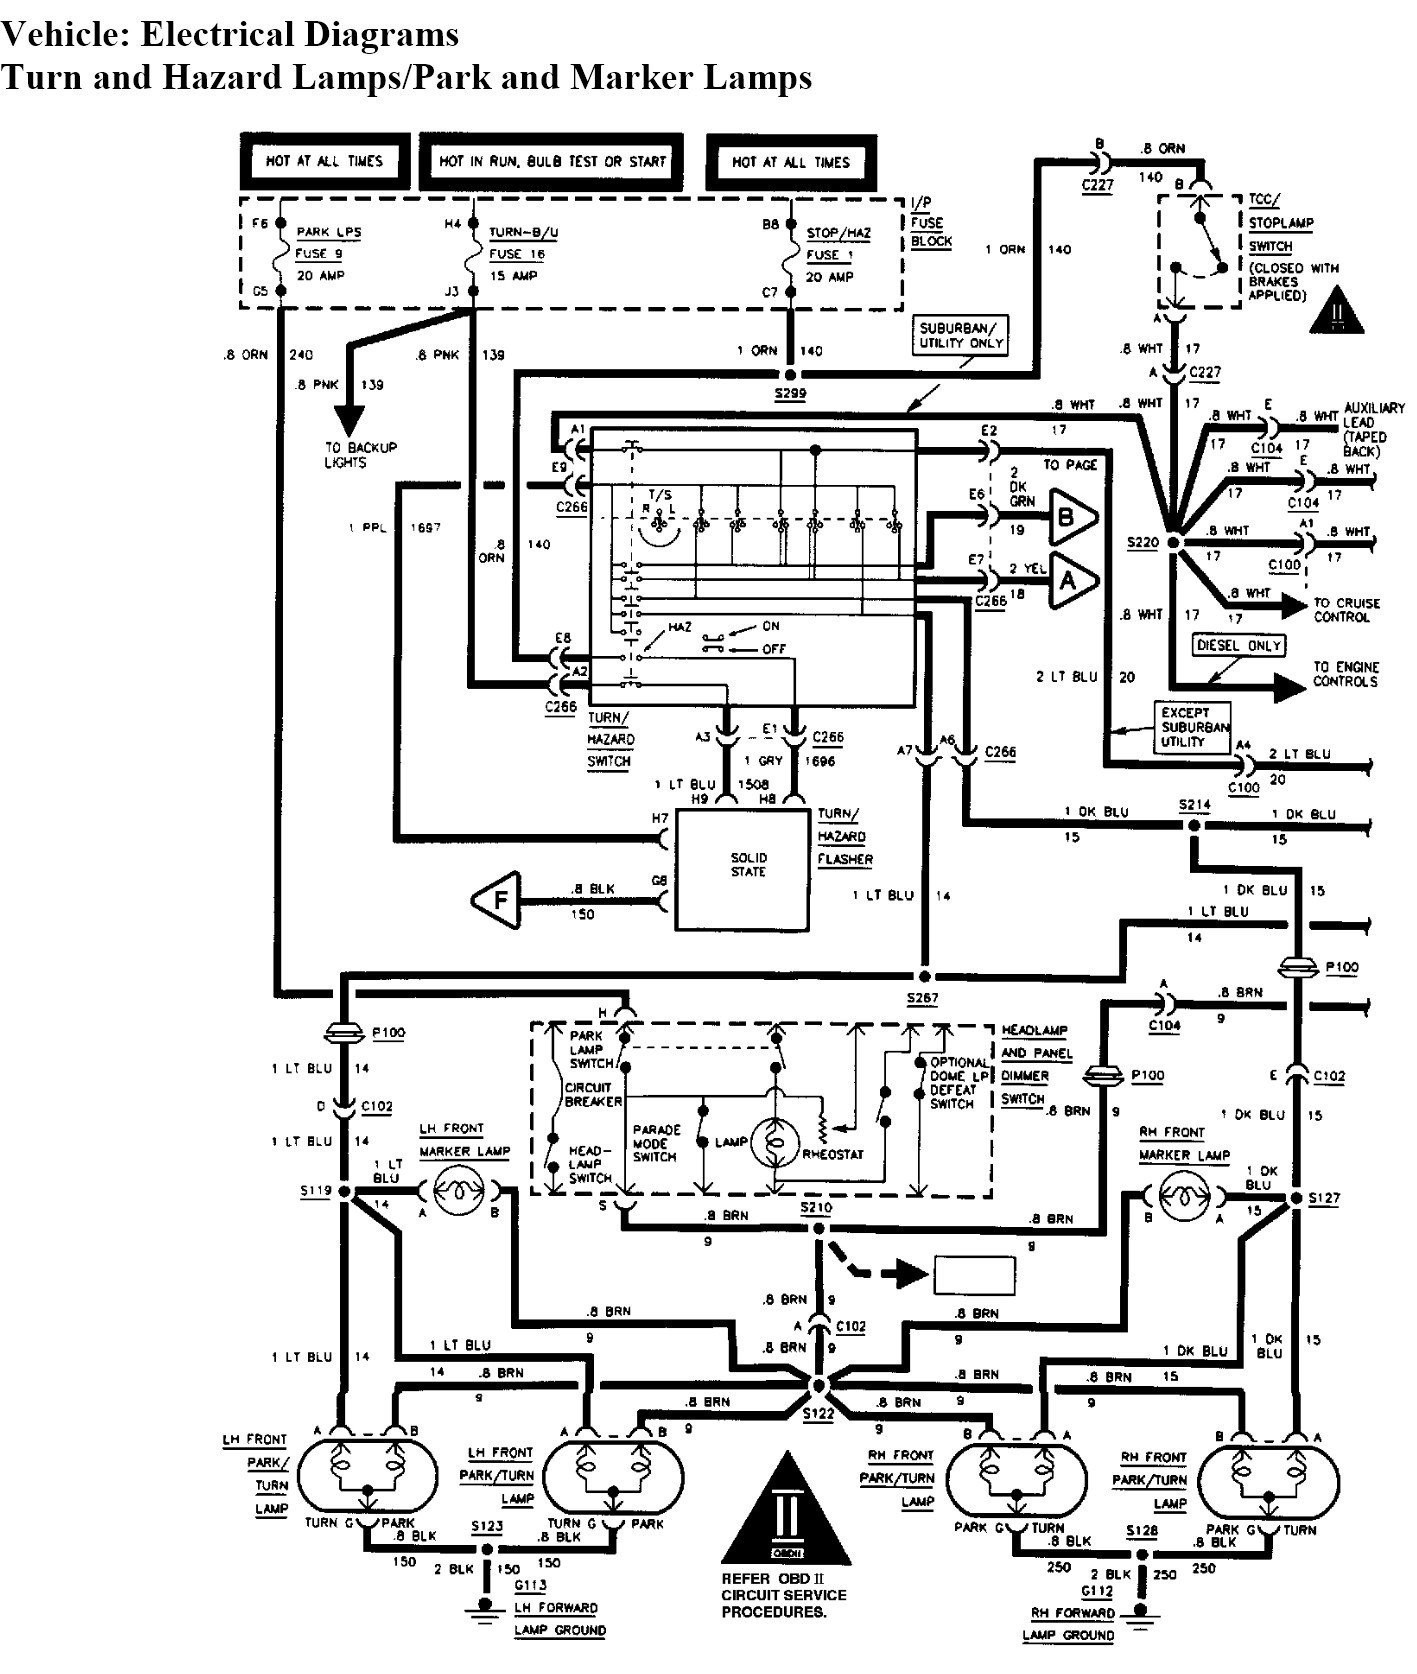 2000 Chevy 1500 Wiring Diagram | Recent Wiring Diagram route | Chevy 1500 Wiring Diagram 2000 |  | driver.pure-media.it